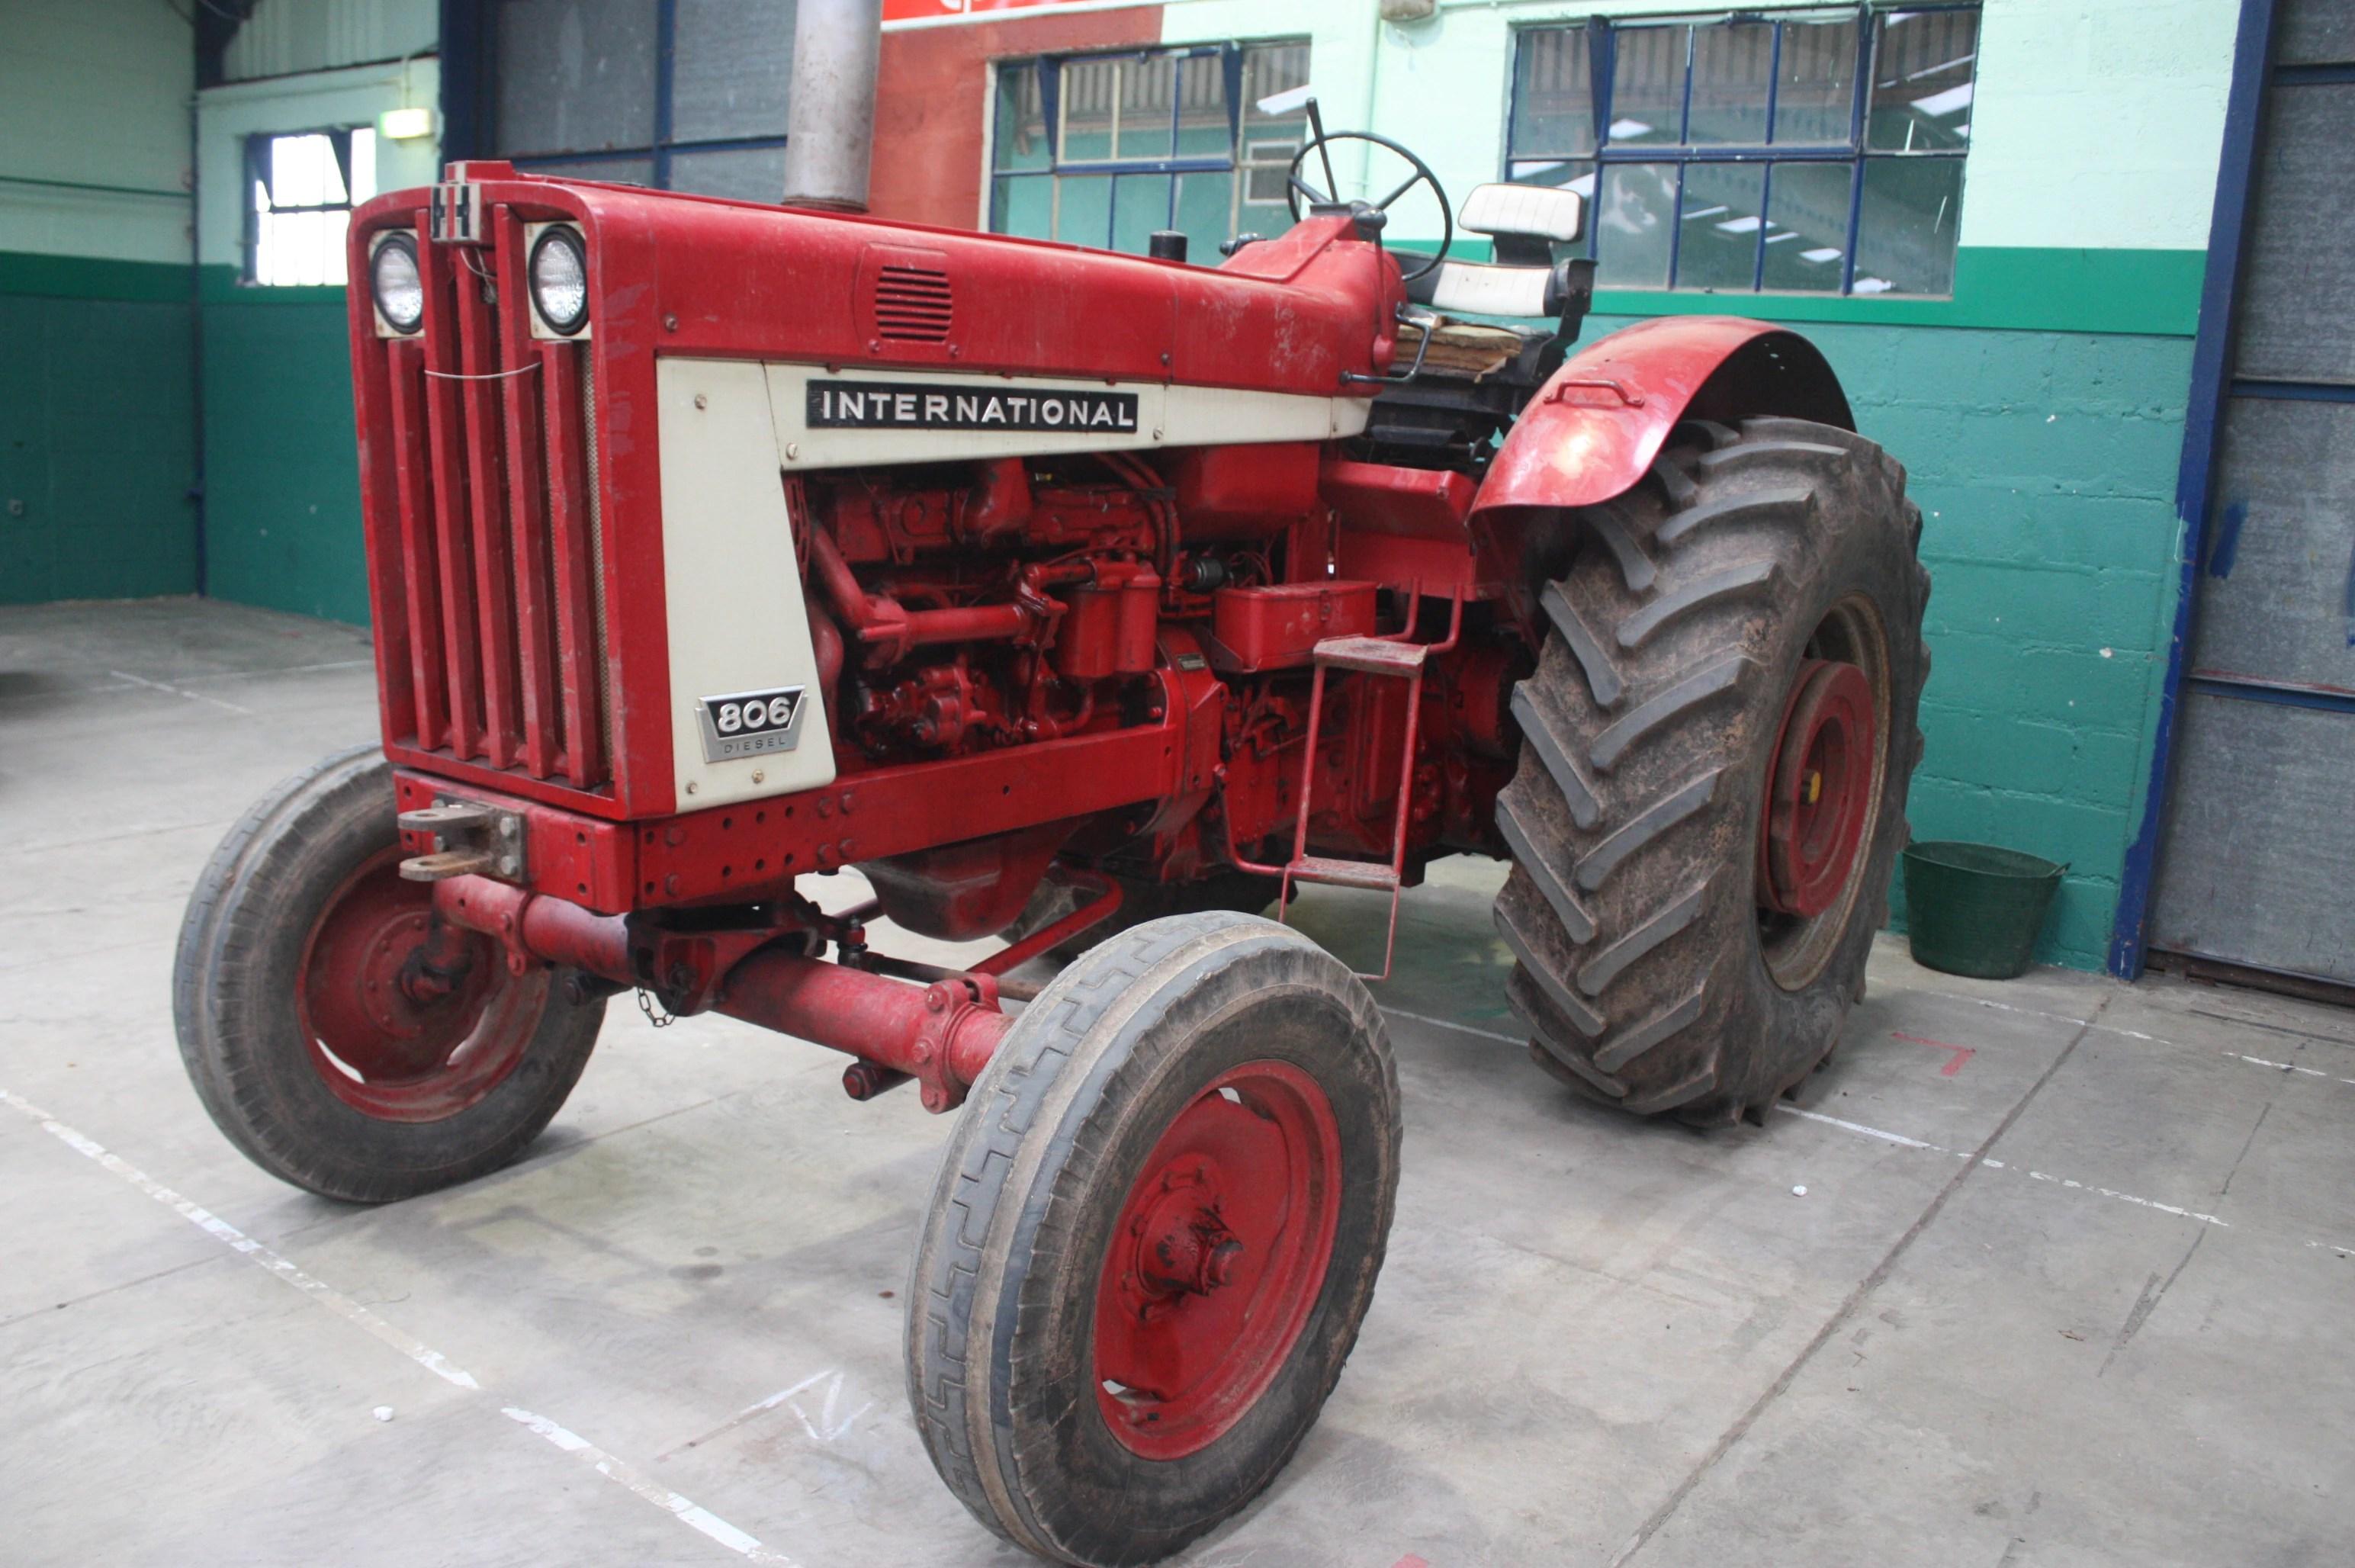 ih 504 utility tractor parts diagram circuit diagram symbols u2022 international pedal tractor parts 504 [ 3088 x 2056 Pixel ]